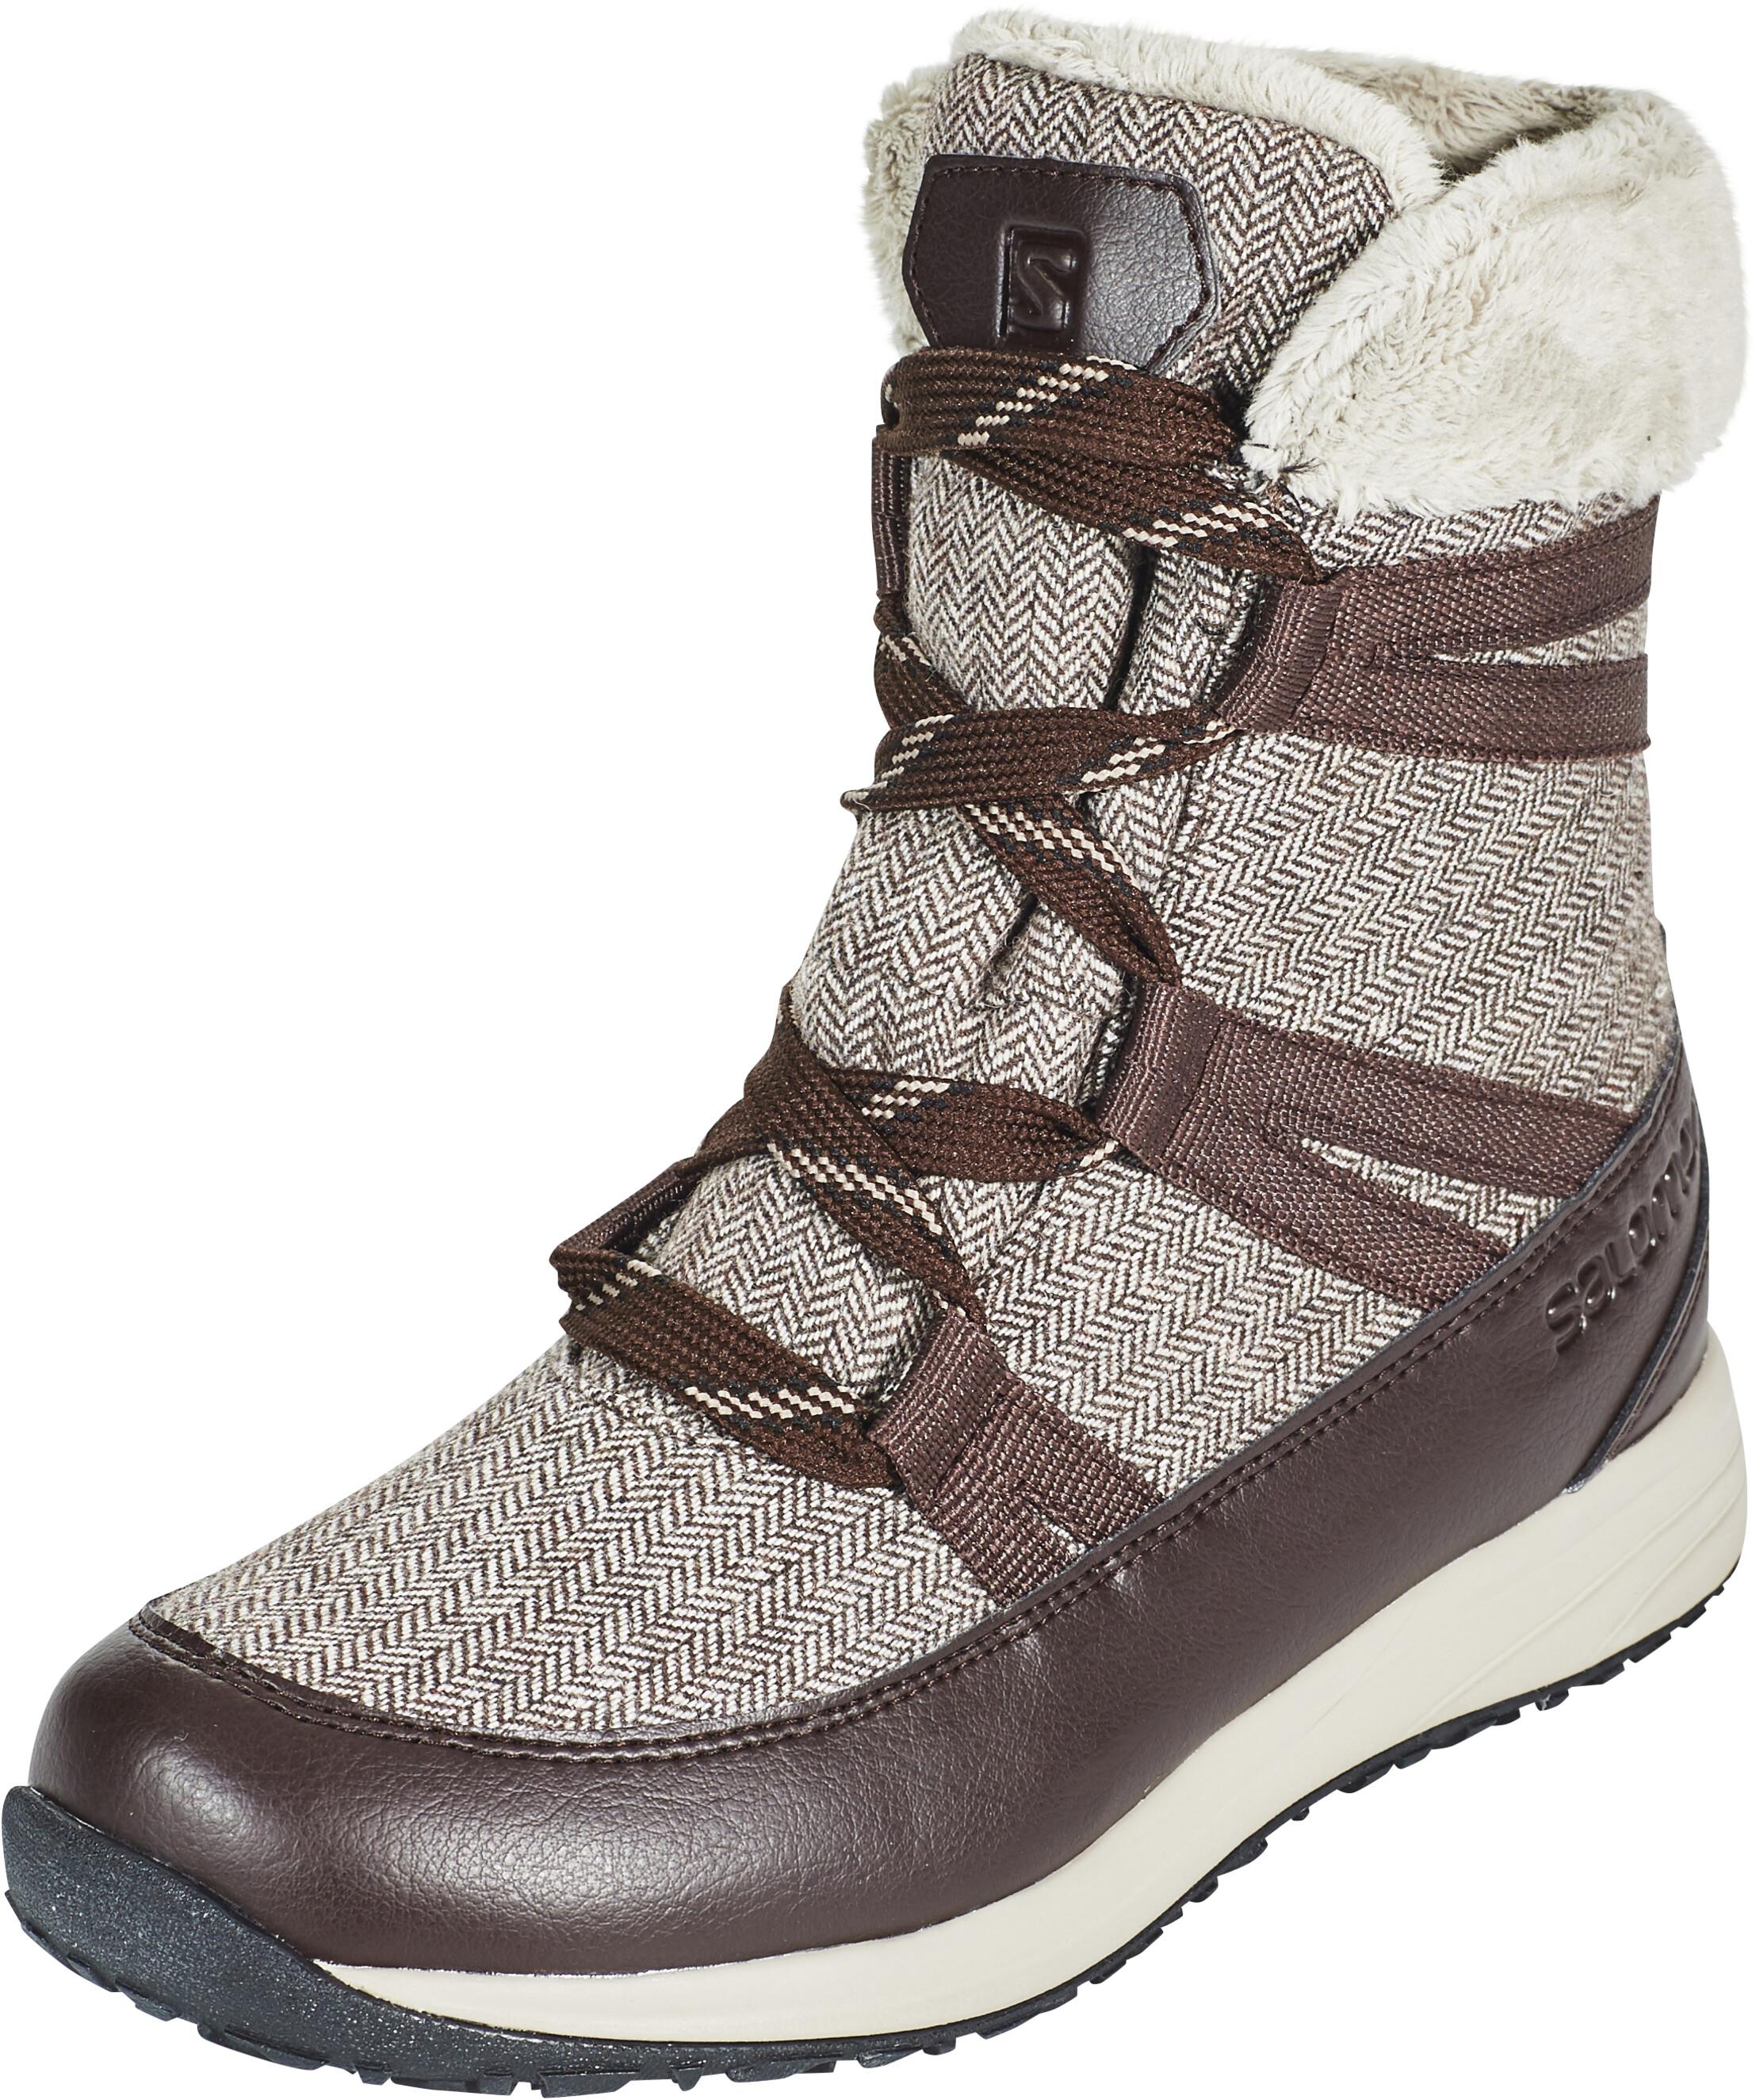 104427d60efe Salomon Heika CS WP Boots Women beige brown at Addnature.co.uk